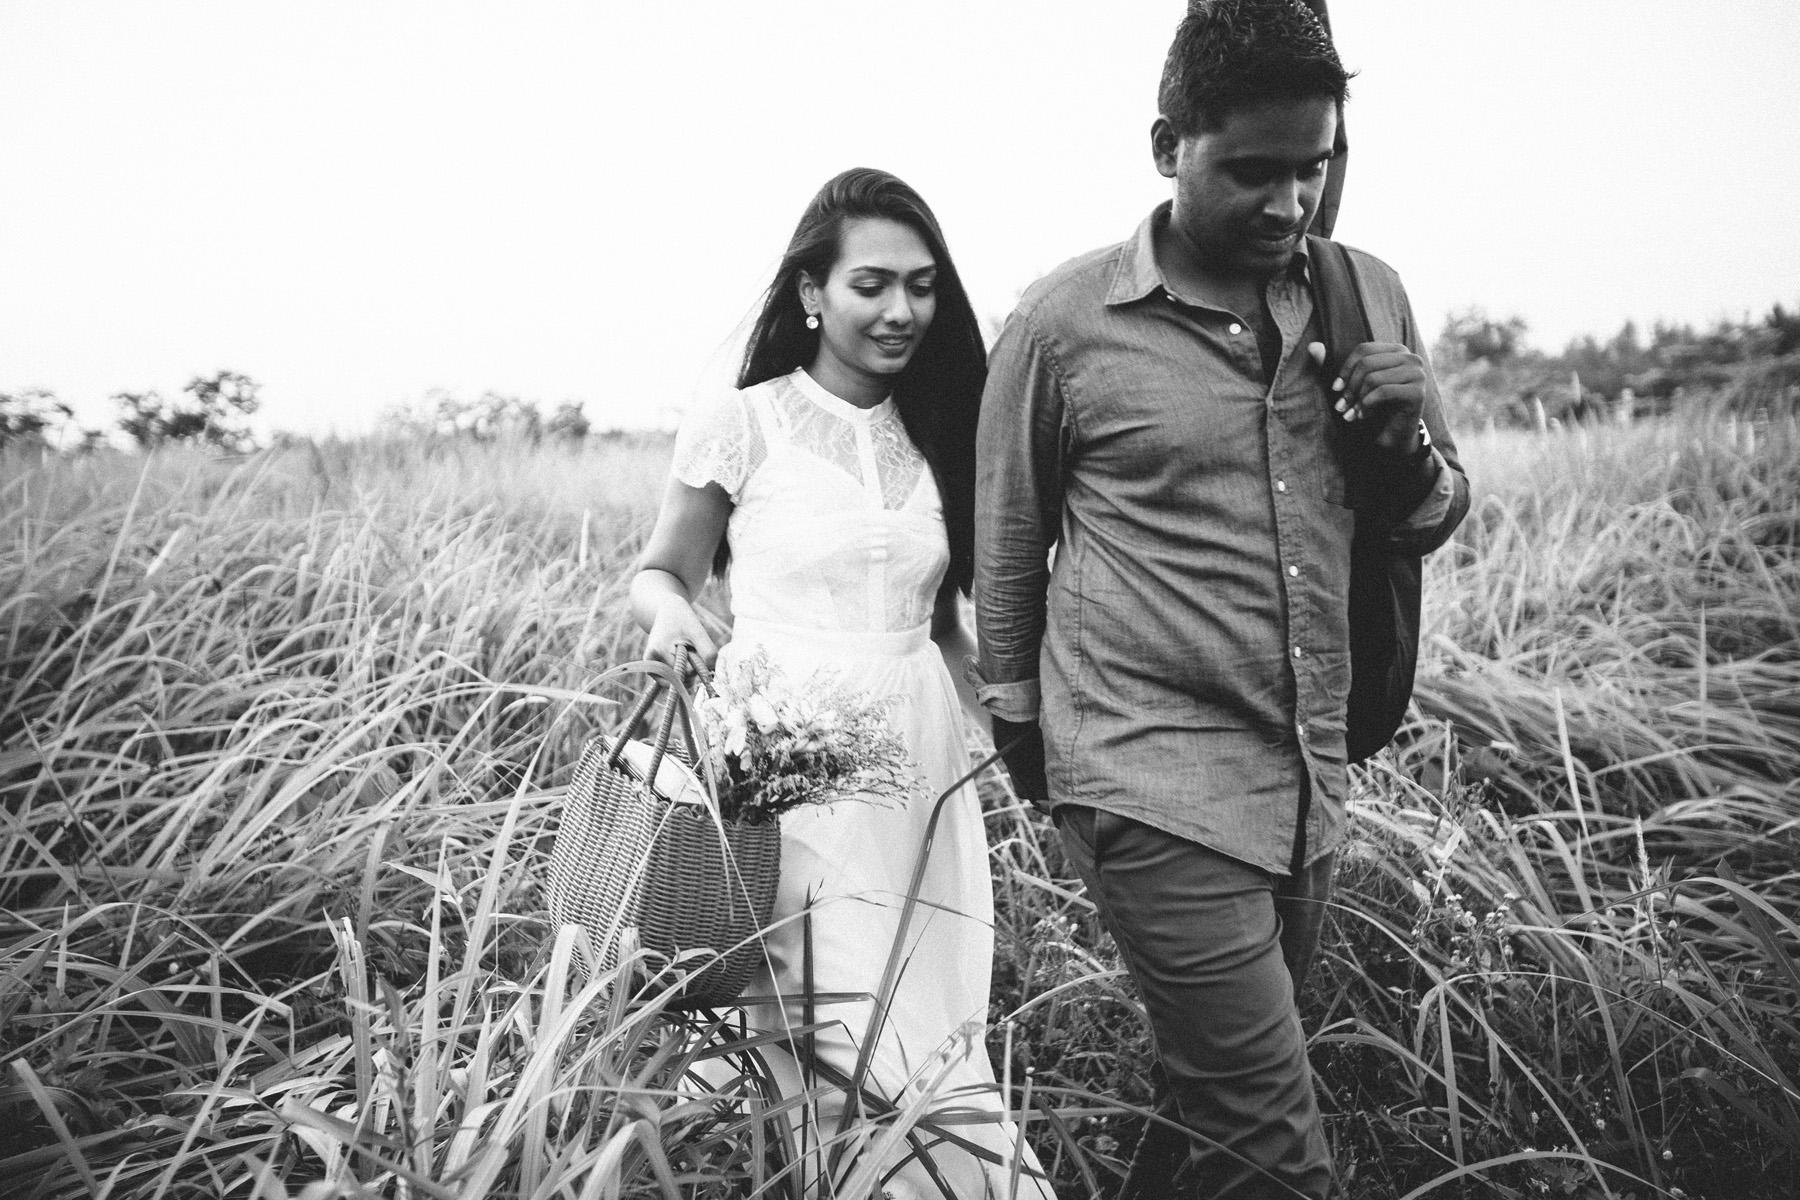 singapore-wedding-travel-photographer-abigail-caleb-wedding-wmt-11.jpg